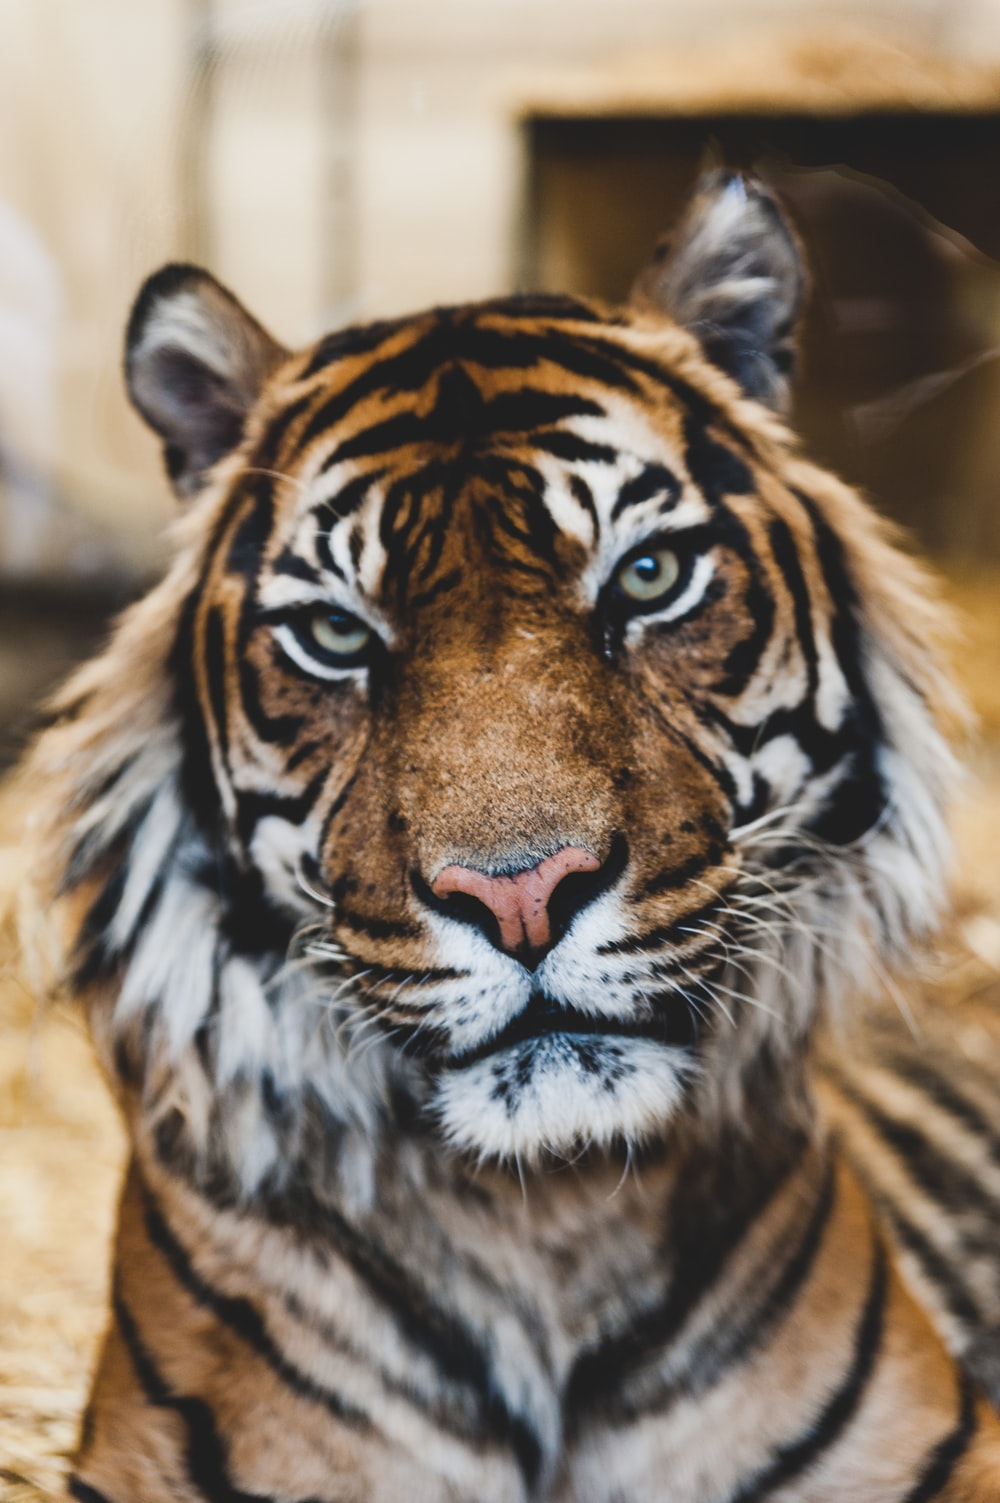 majestic tiger photo by ian robinson ianrobinson on unsplash